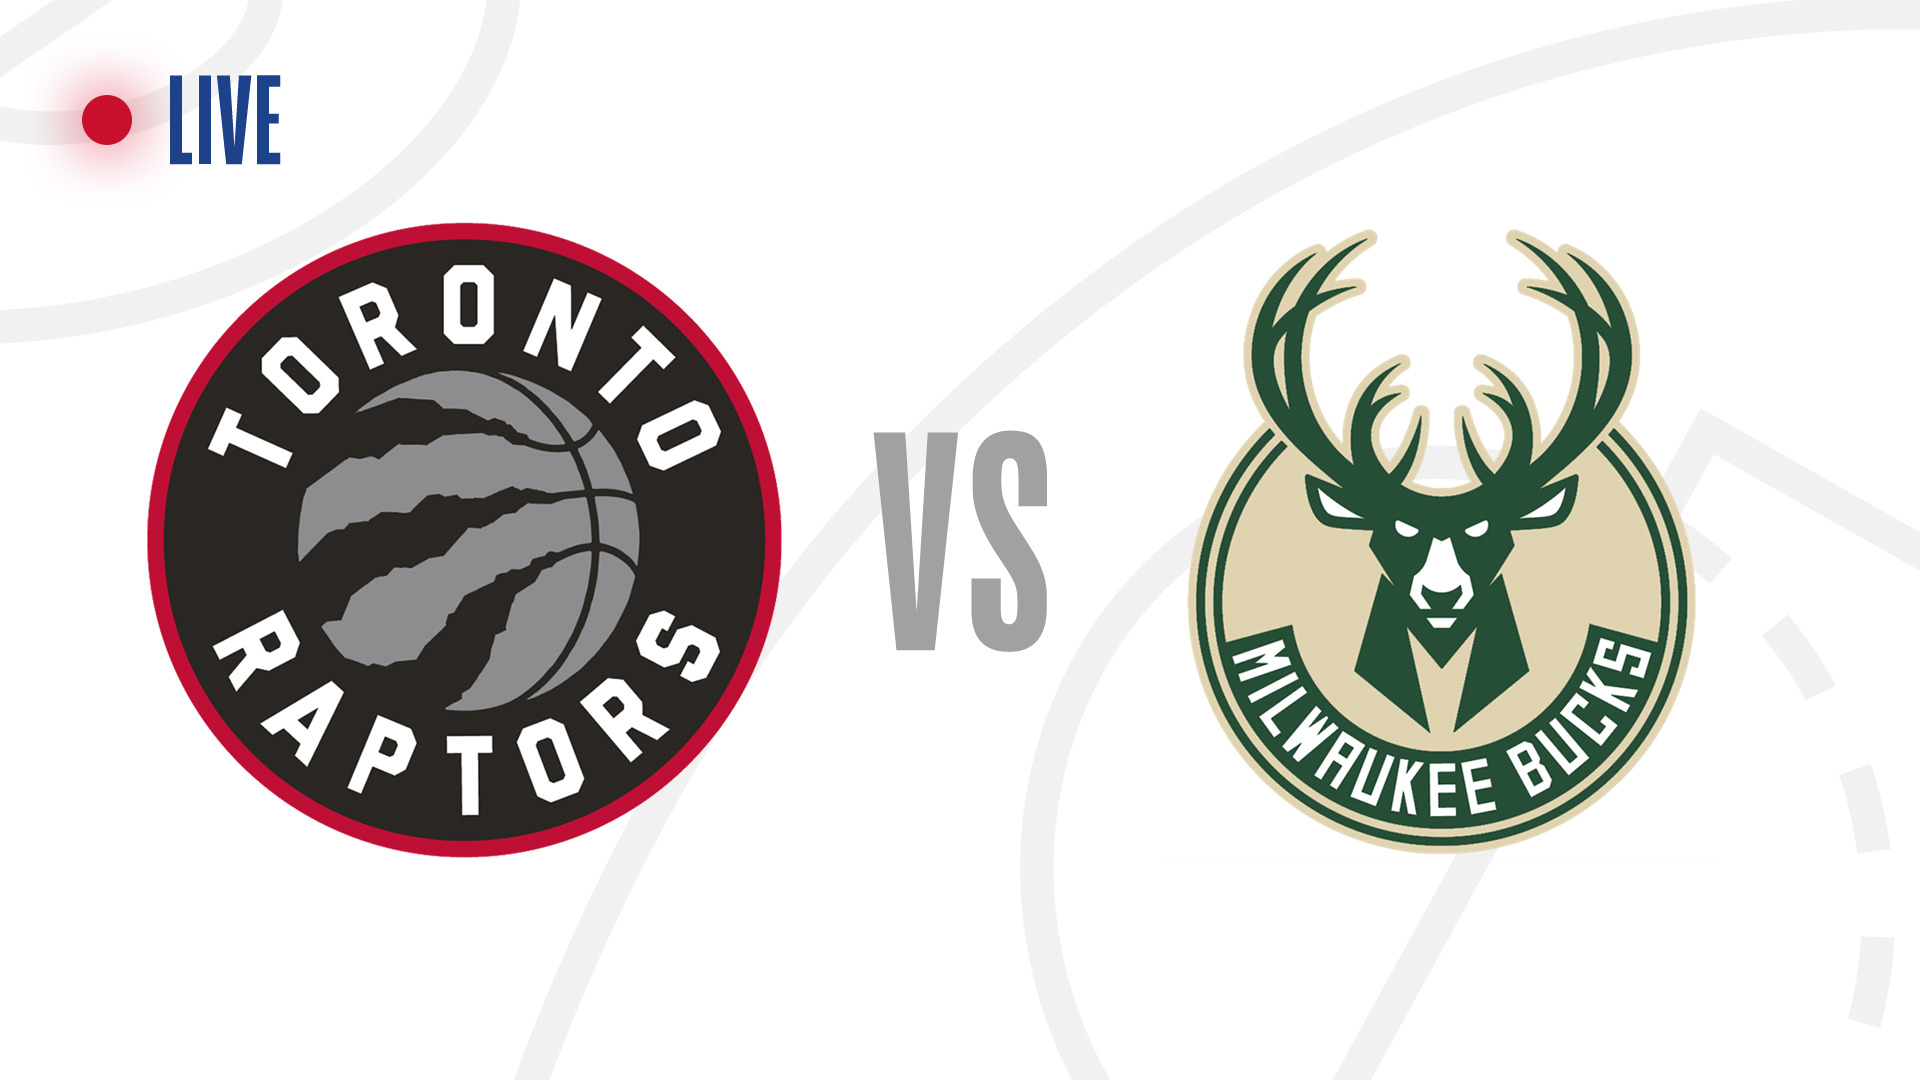 Nba Playoffs 2019 Toronto Raptors Vs Milwaukee Bucks